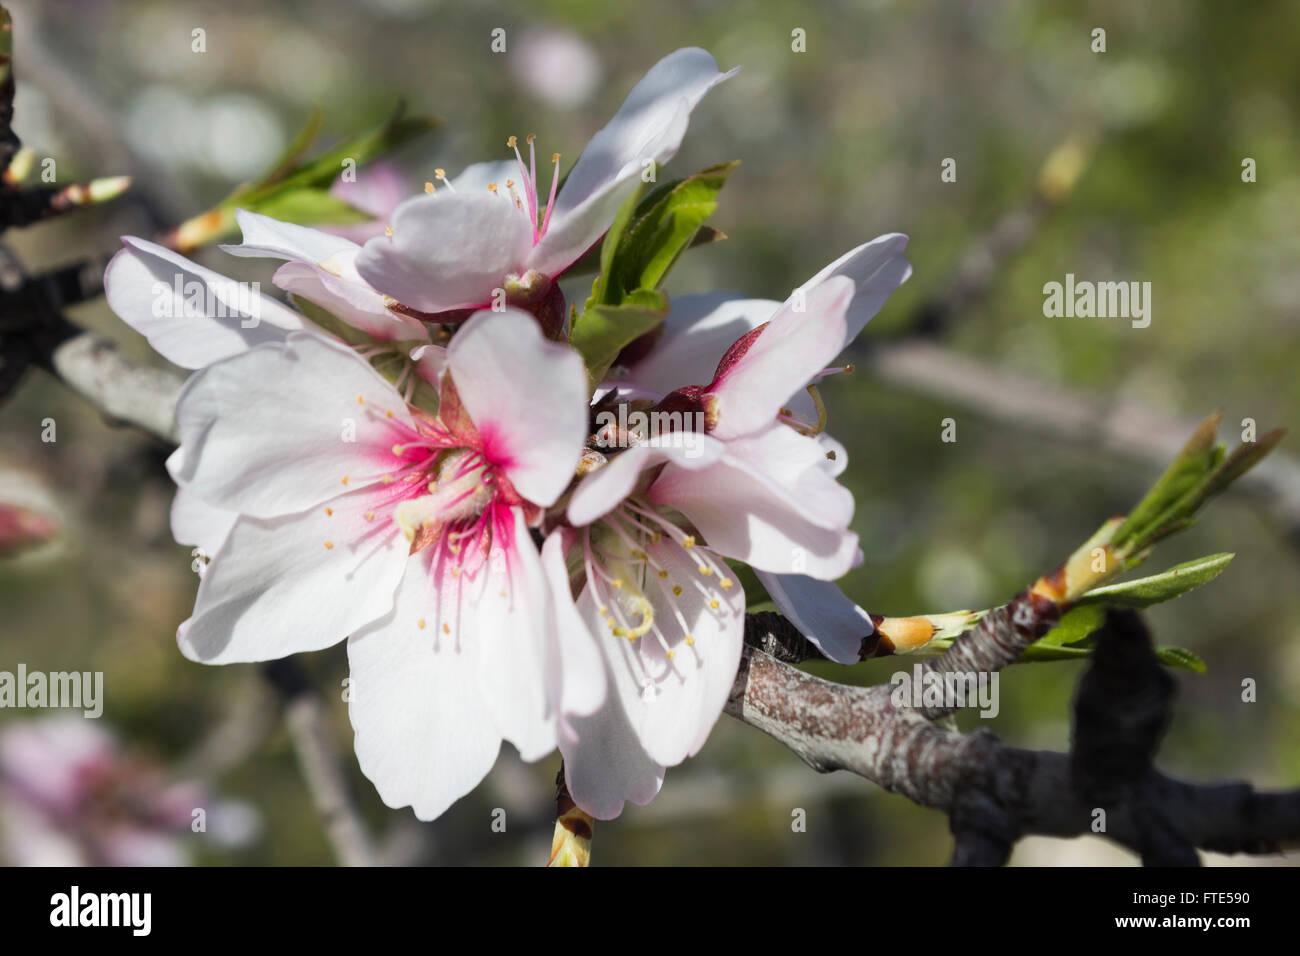 Almond blossom, Prunus dulcis, in flower in Spain, springtime. - Stock Image